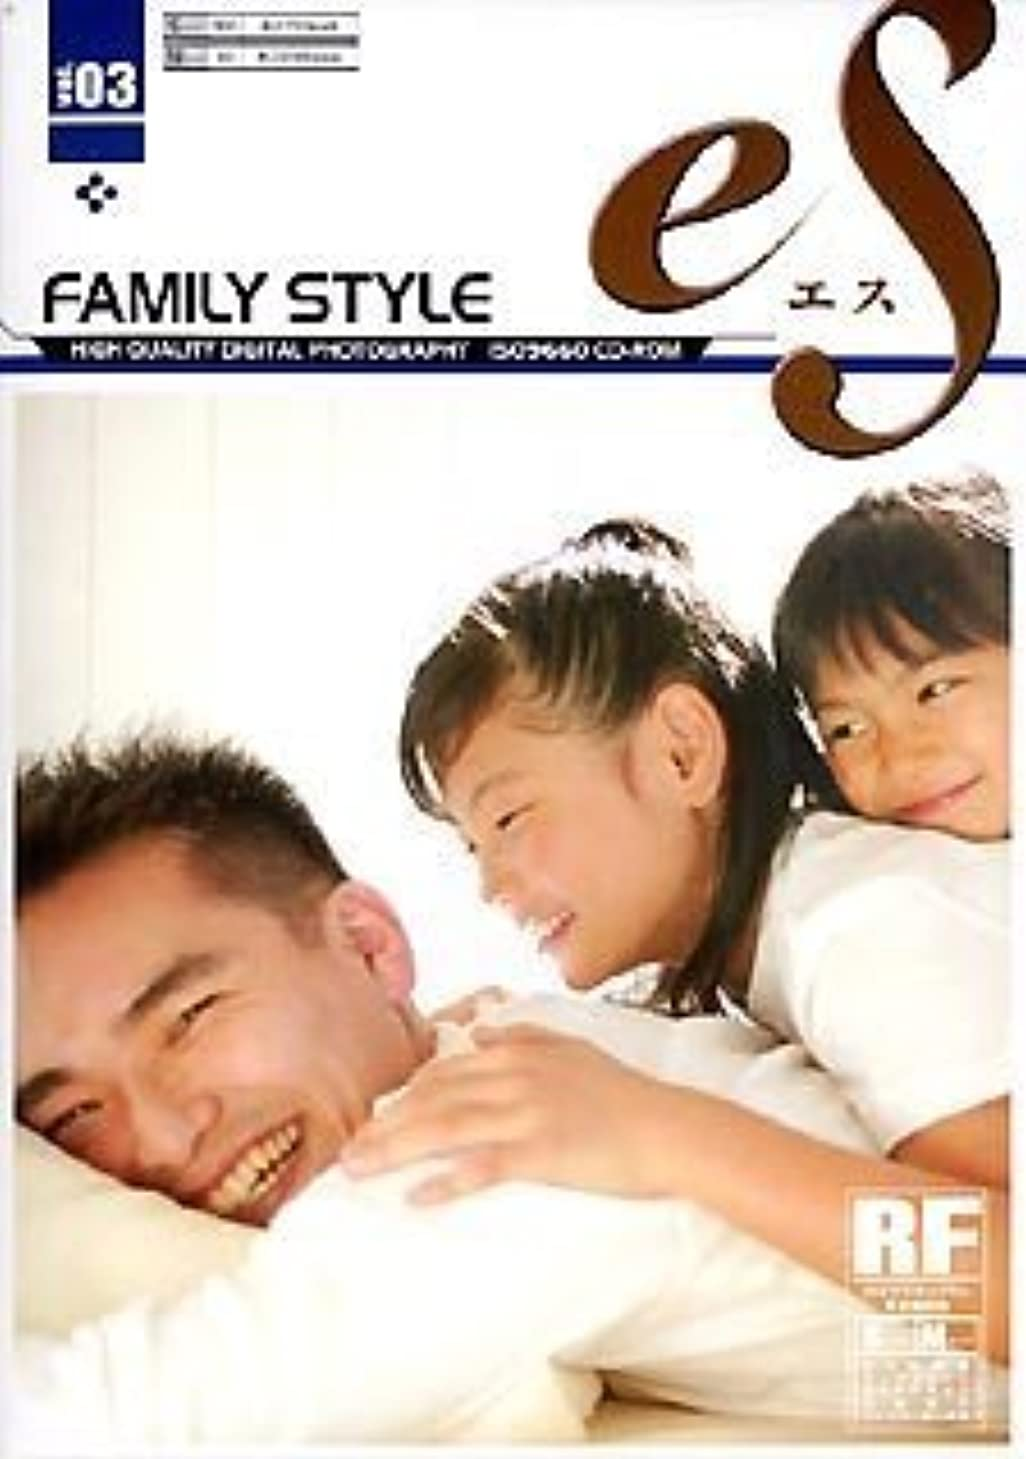 eS Vol.03 ファミリースタイル ~FAMILY STYLE~